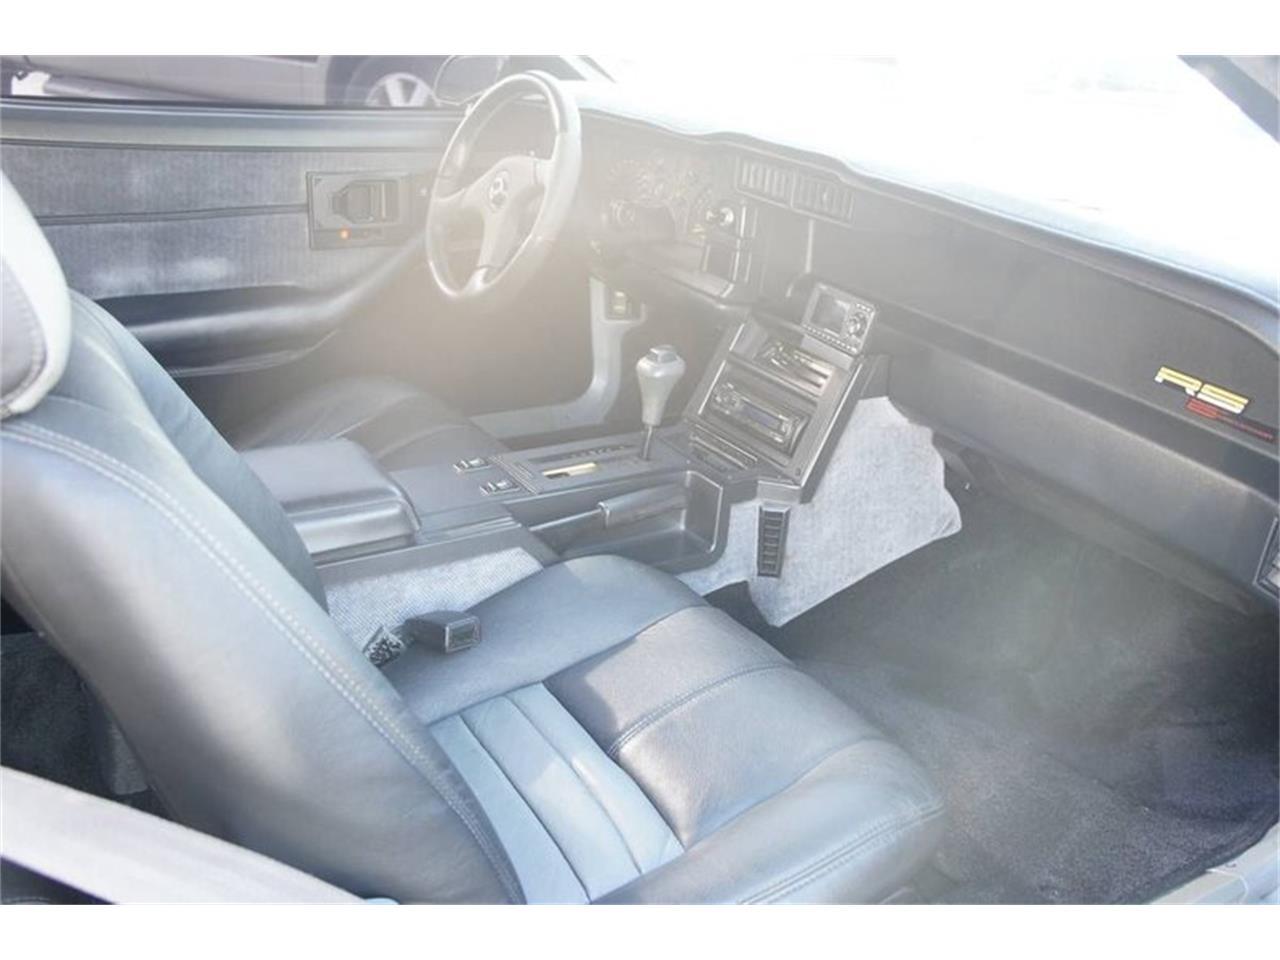 1992 Chevrolet Camaro (CC-1420671) for sale in Lantana, Florida